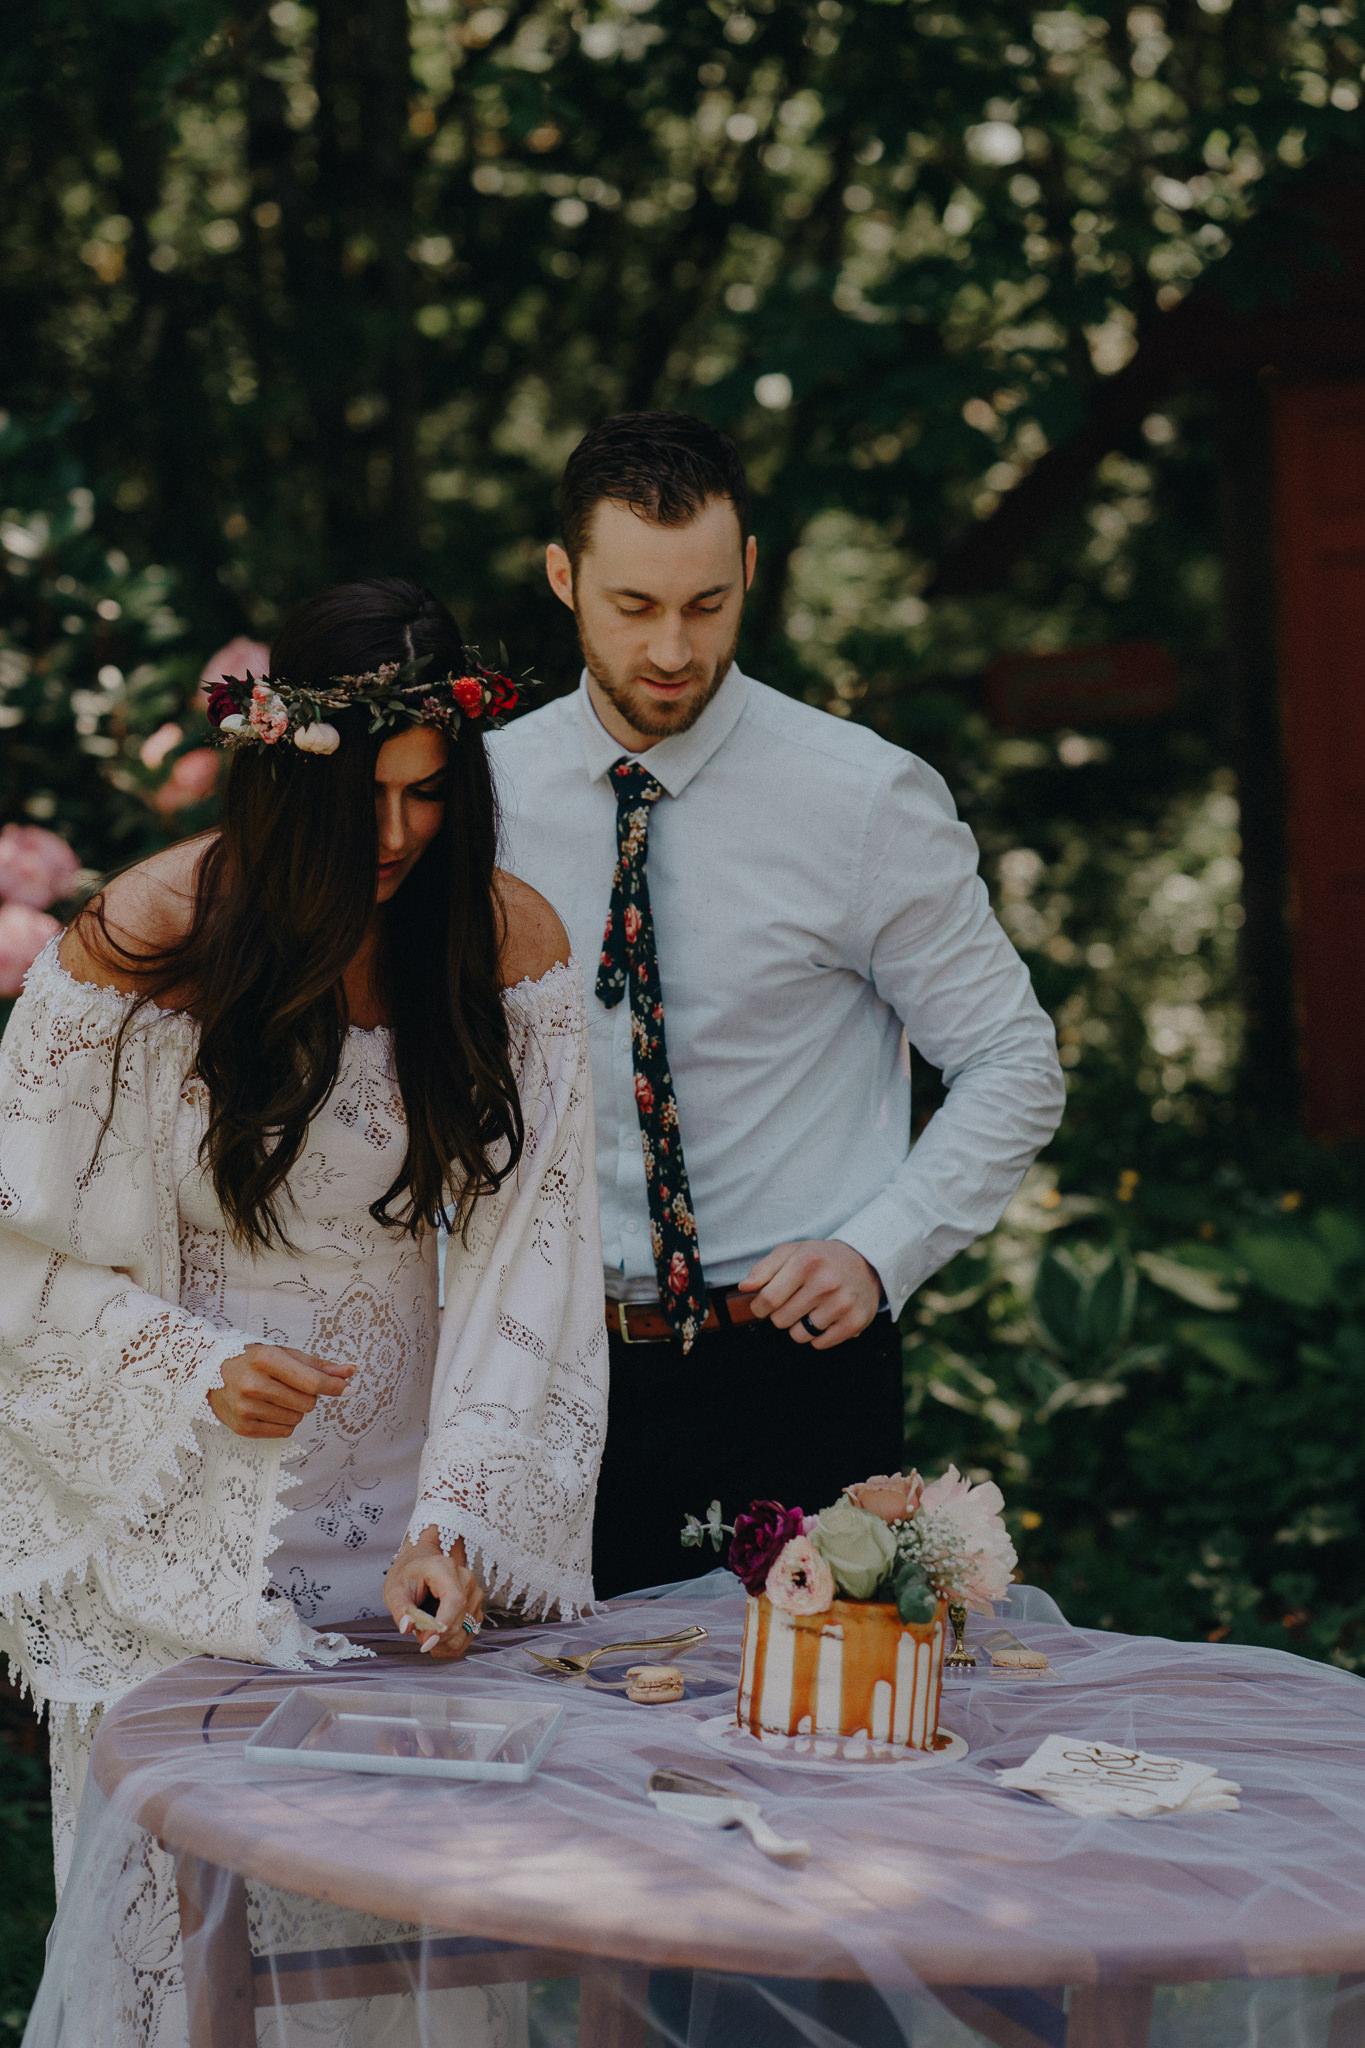 Bride-Groom-Cake-Photography